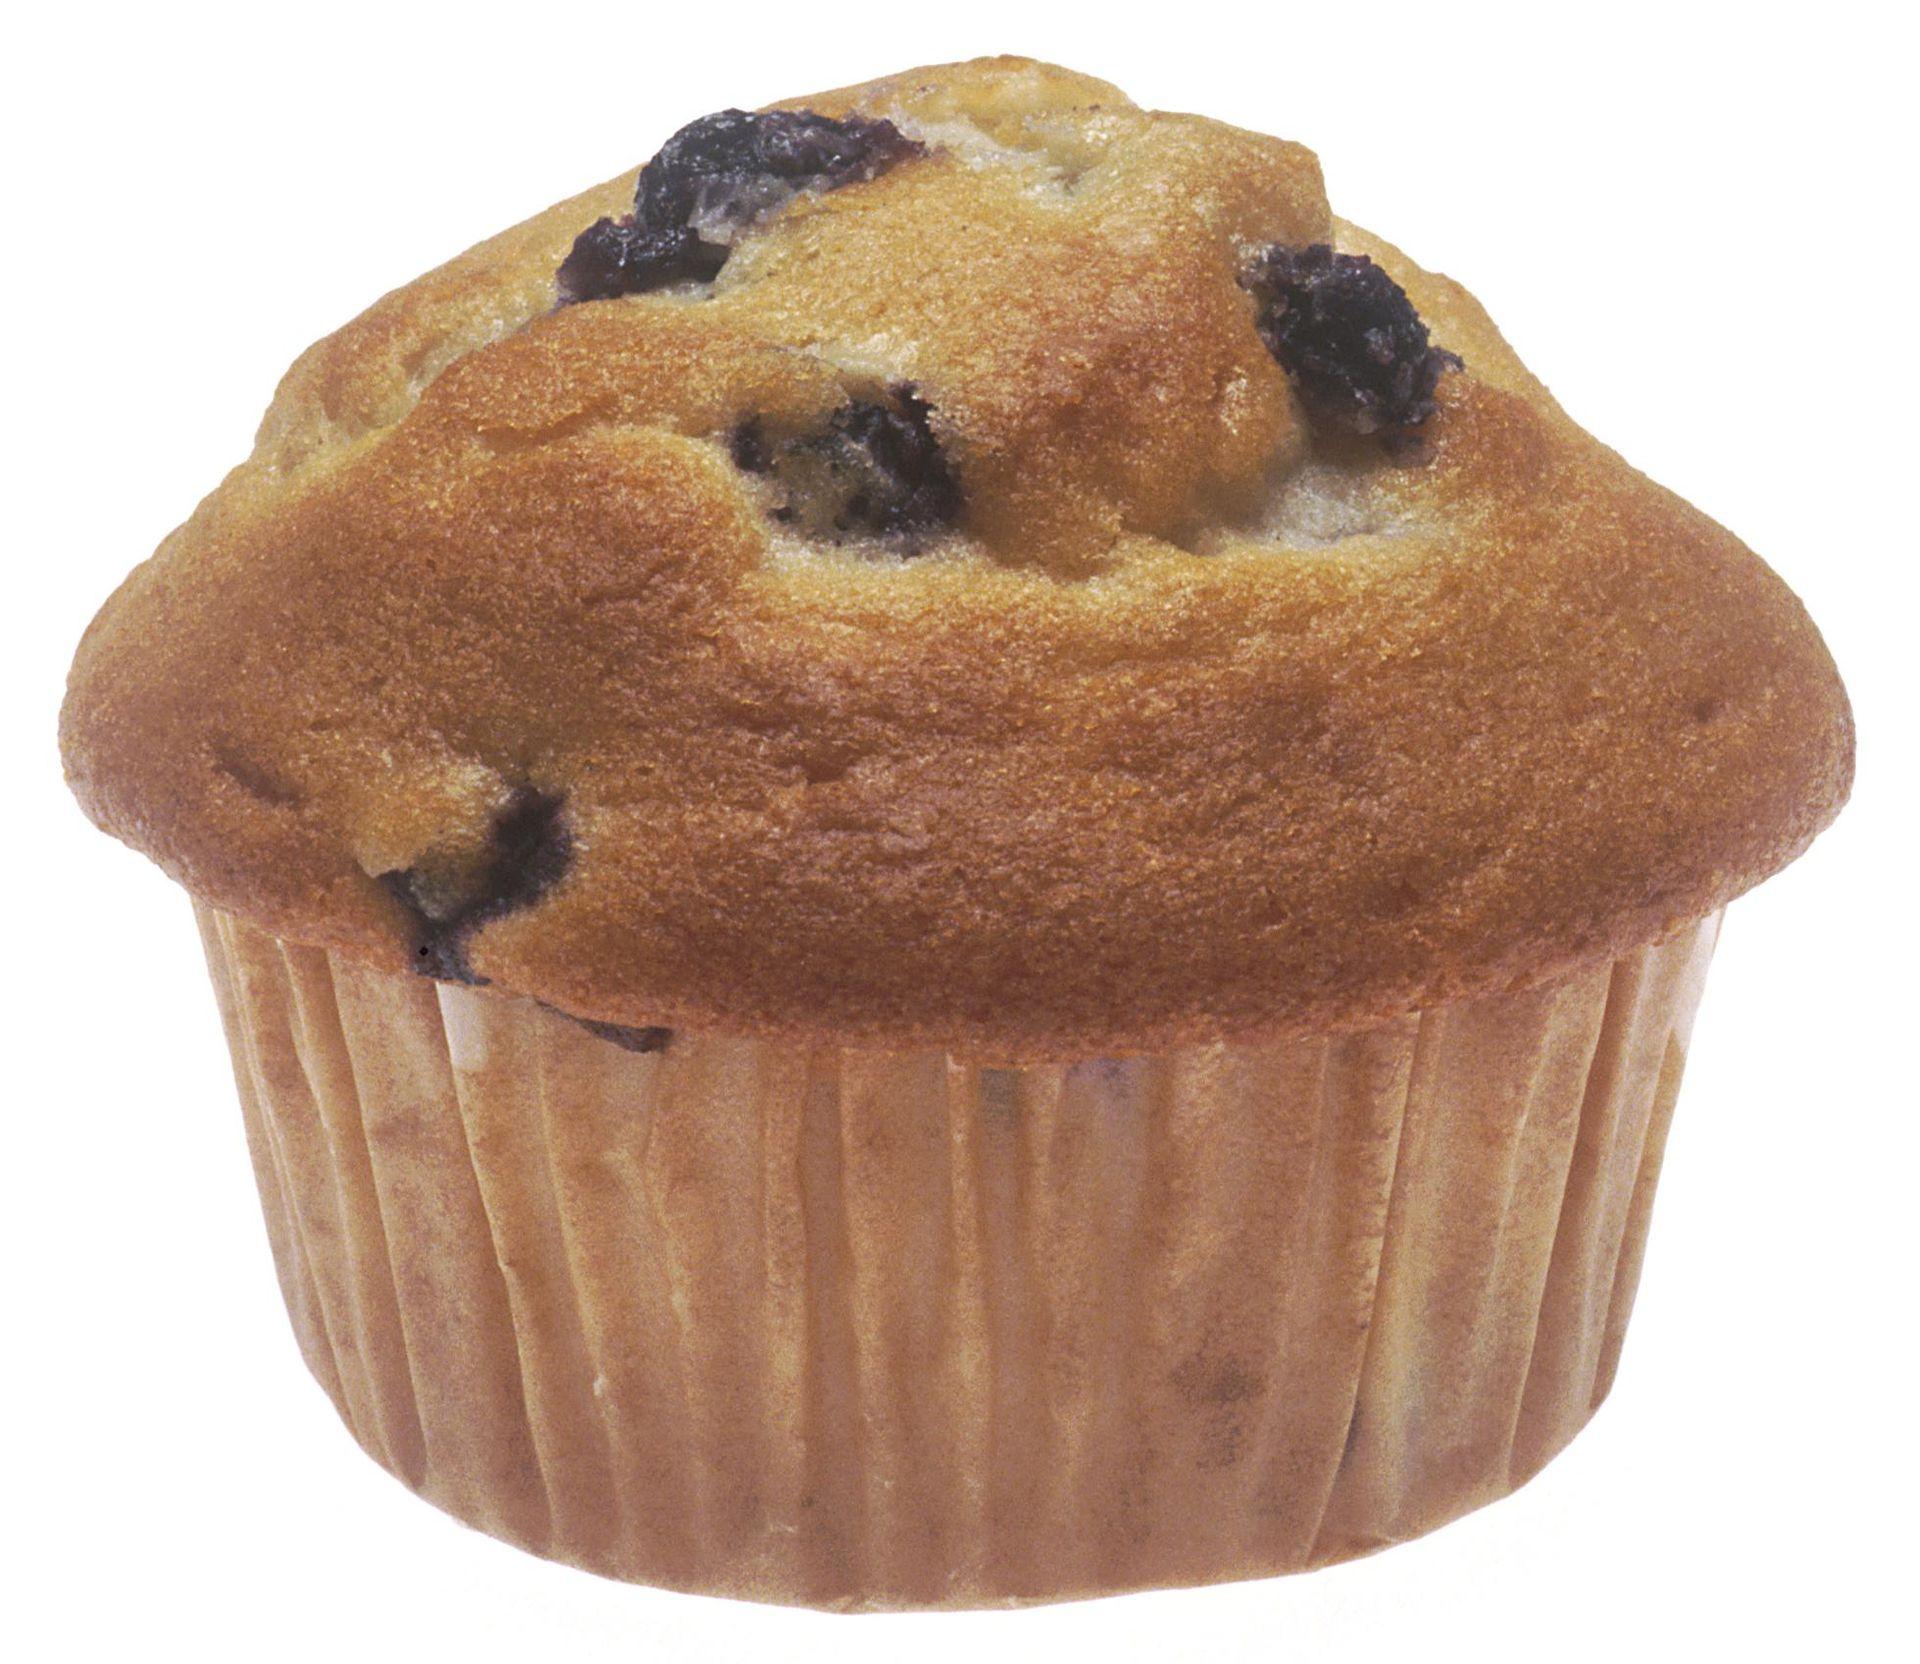 Coffee Cake Muffin Tim Hortons